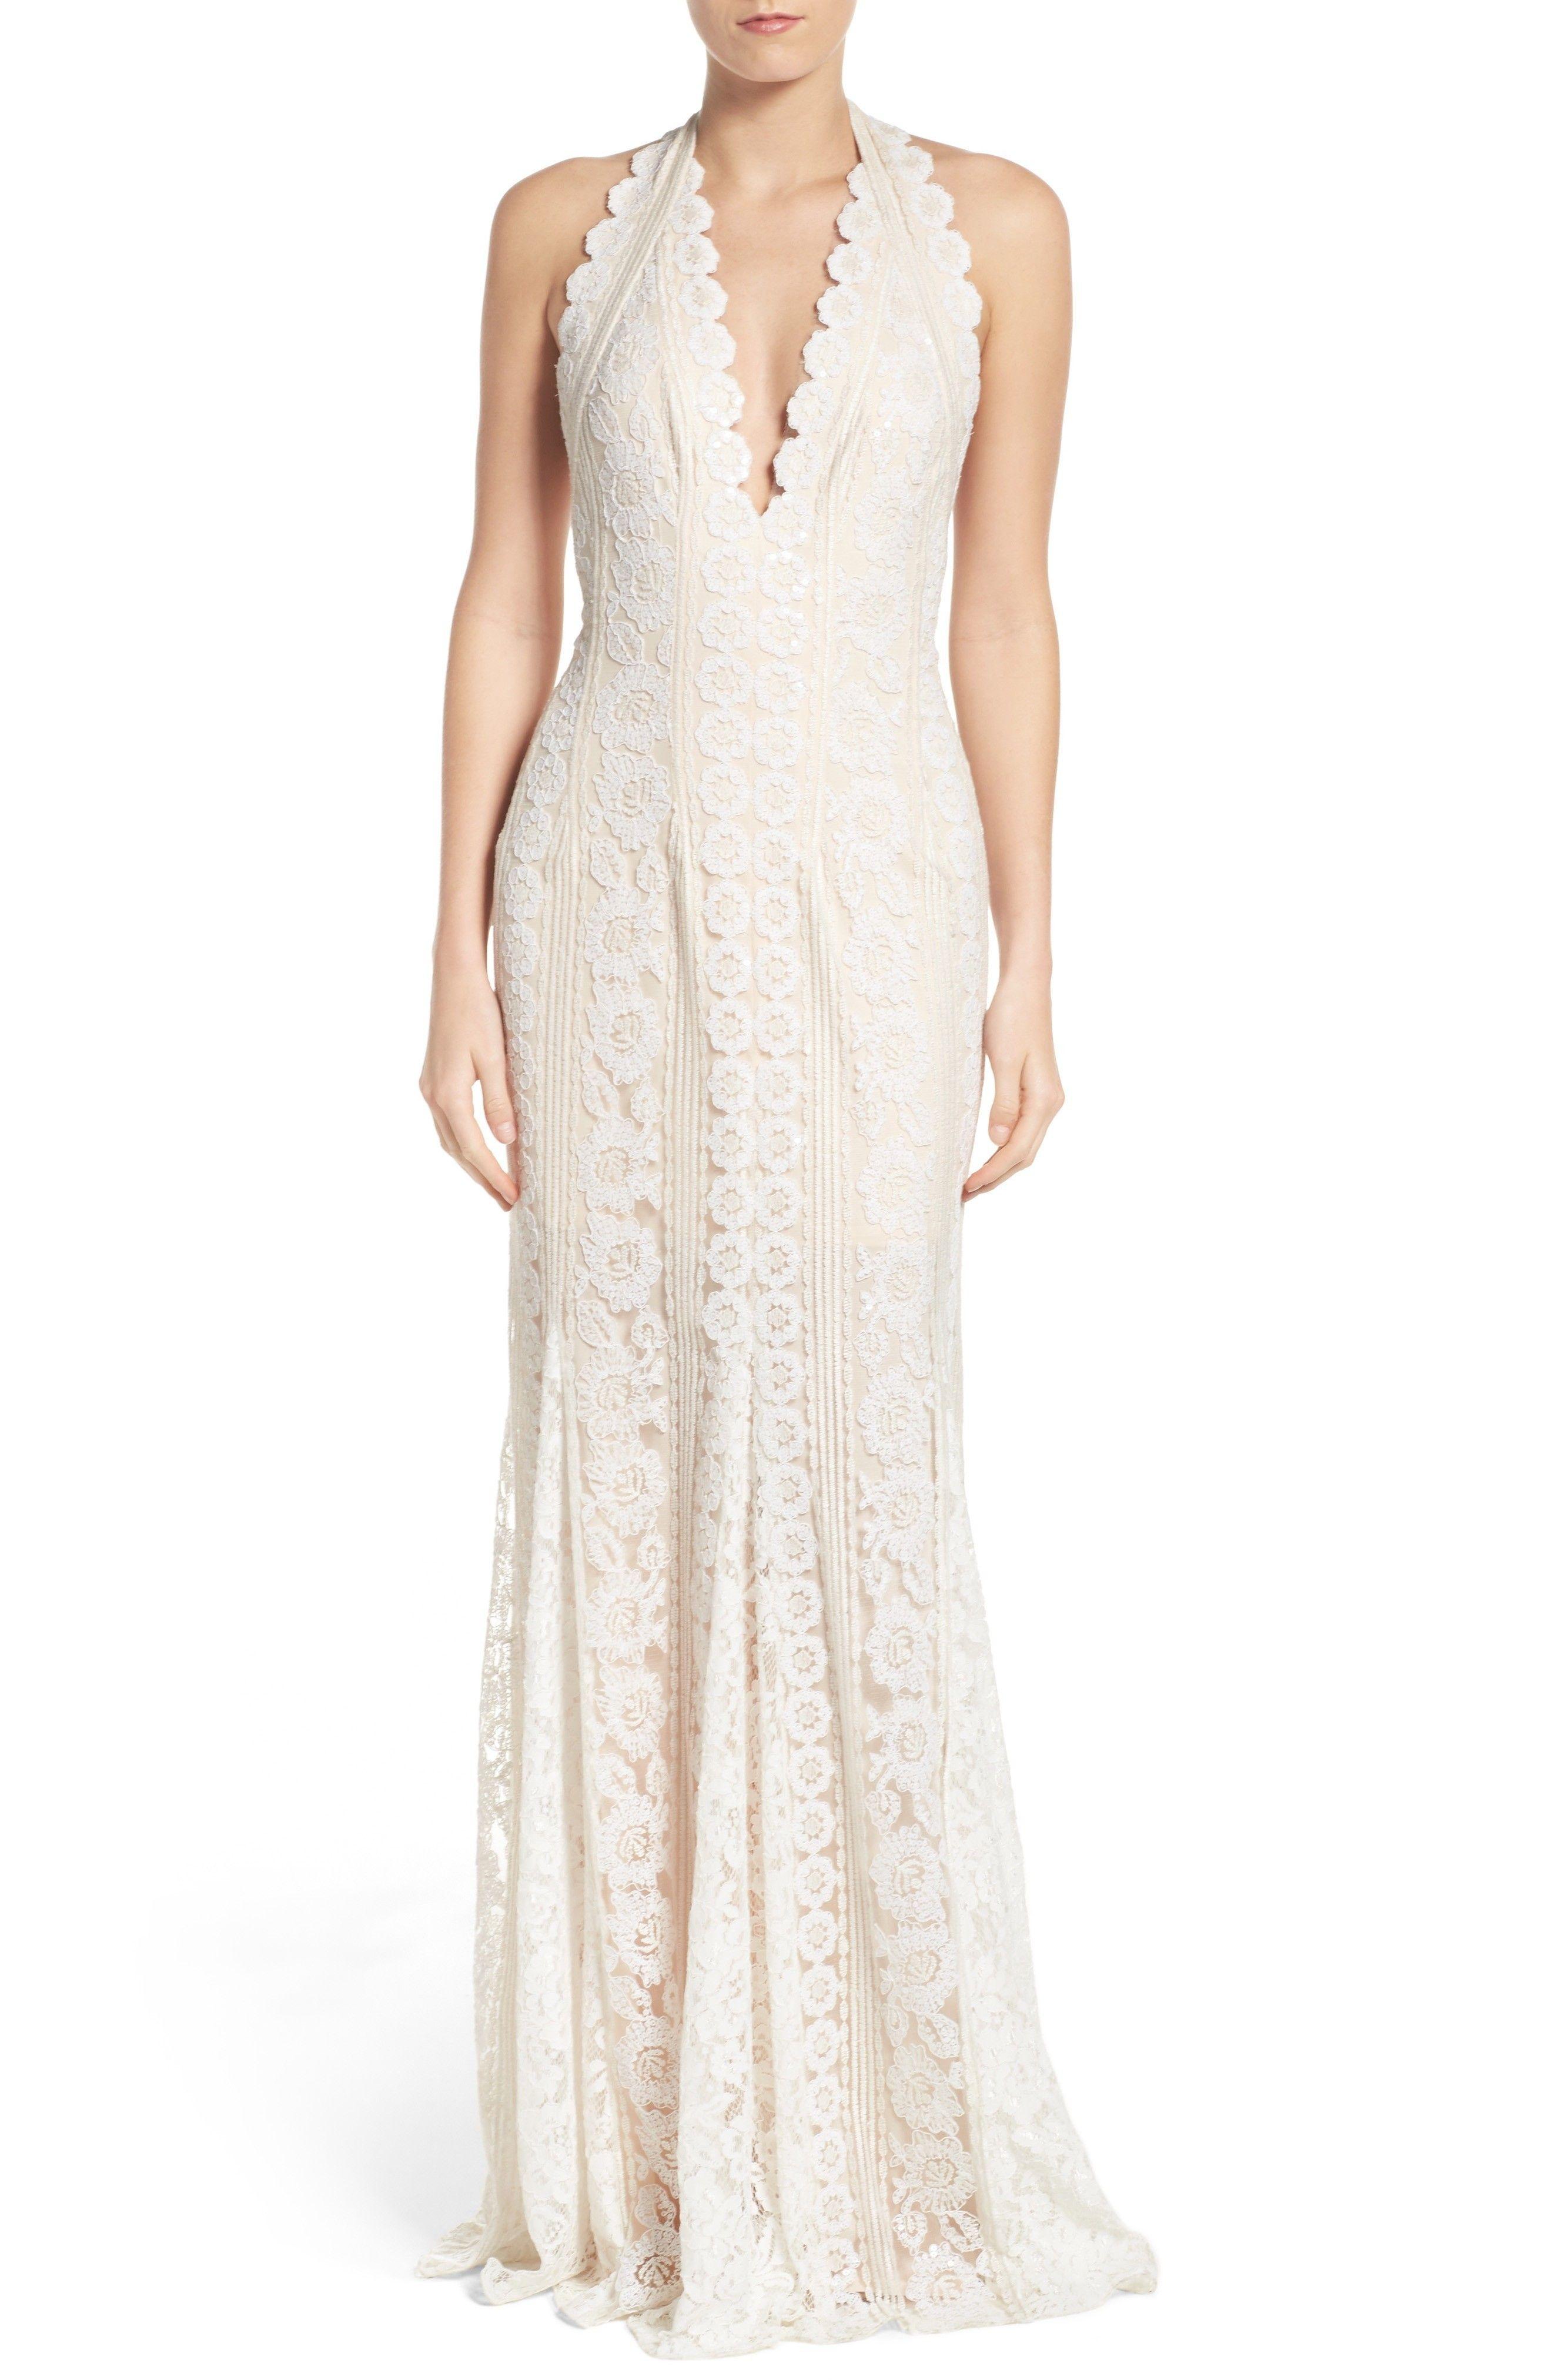 Lace dress for wedding  New Tadashi Shoji Deep V Lace Gown Soft White Grey fashion dress